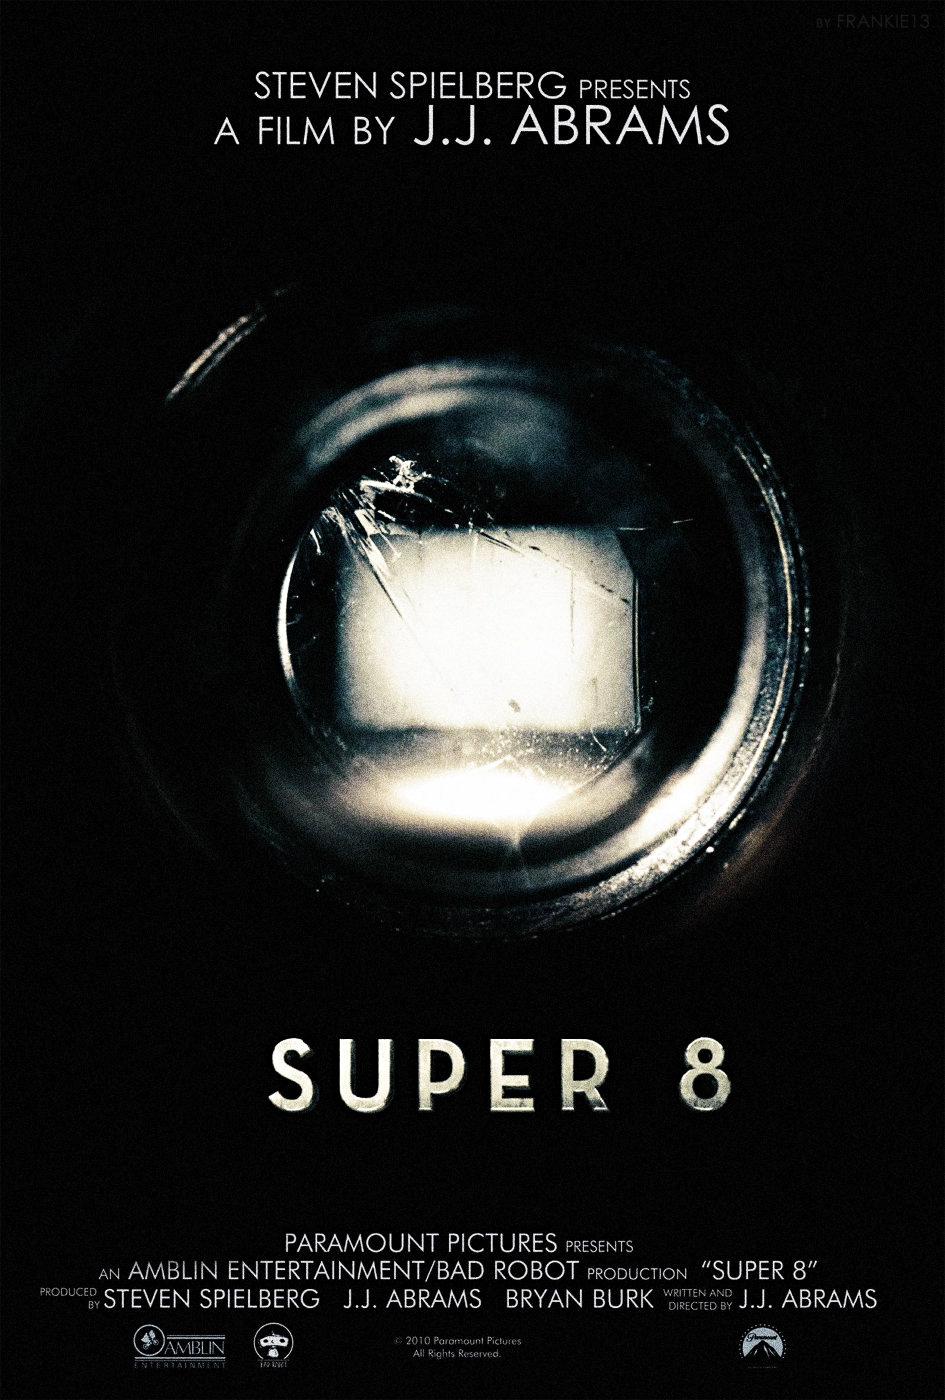 Watch Super 8 Online. super 8 full movie with English subtitle. Stars: AJ Michalka, Kyle Chandler, Elle Fanning.